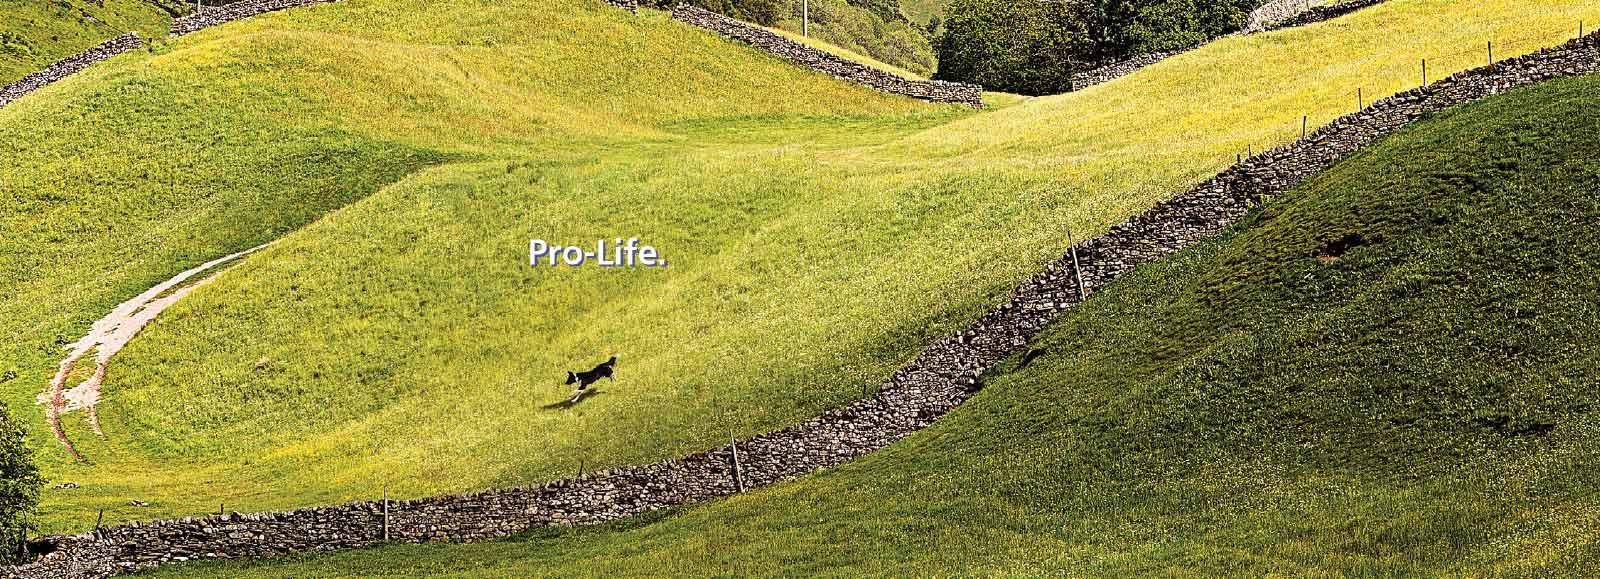 Pro-Life banner